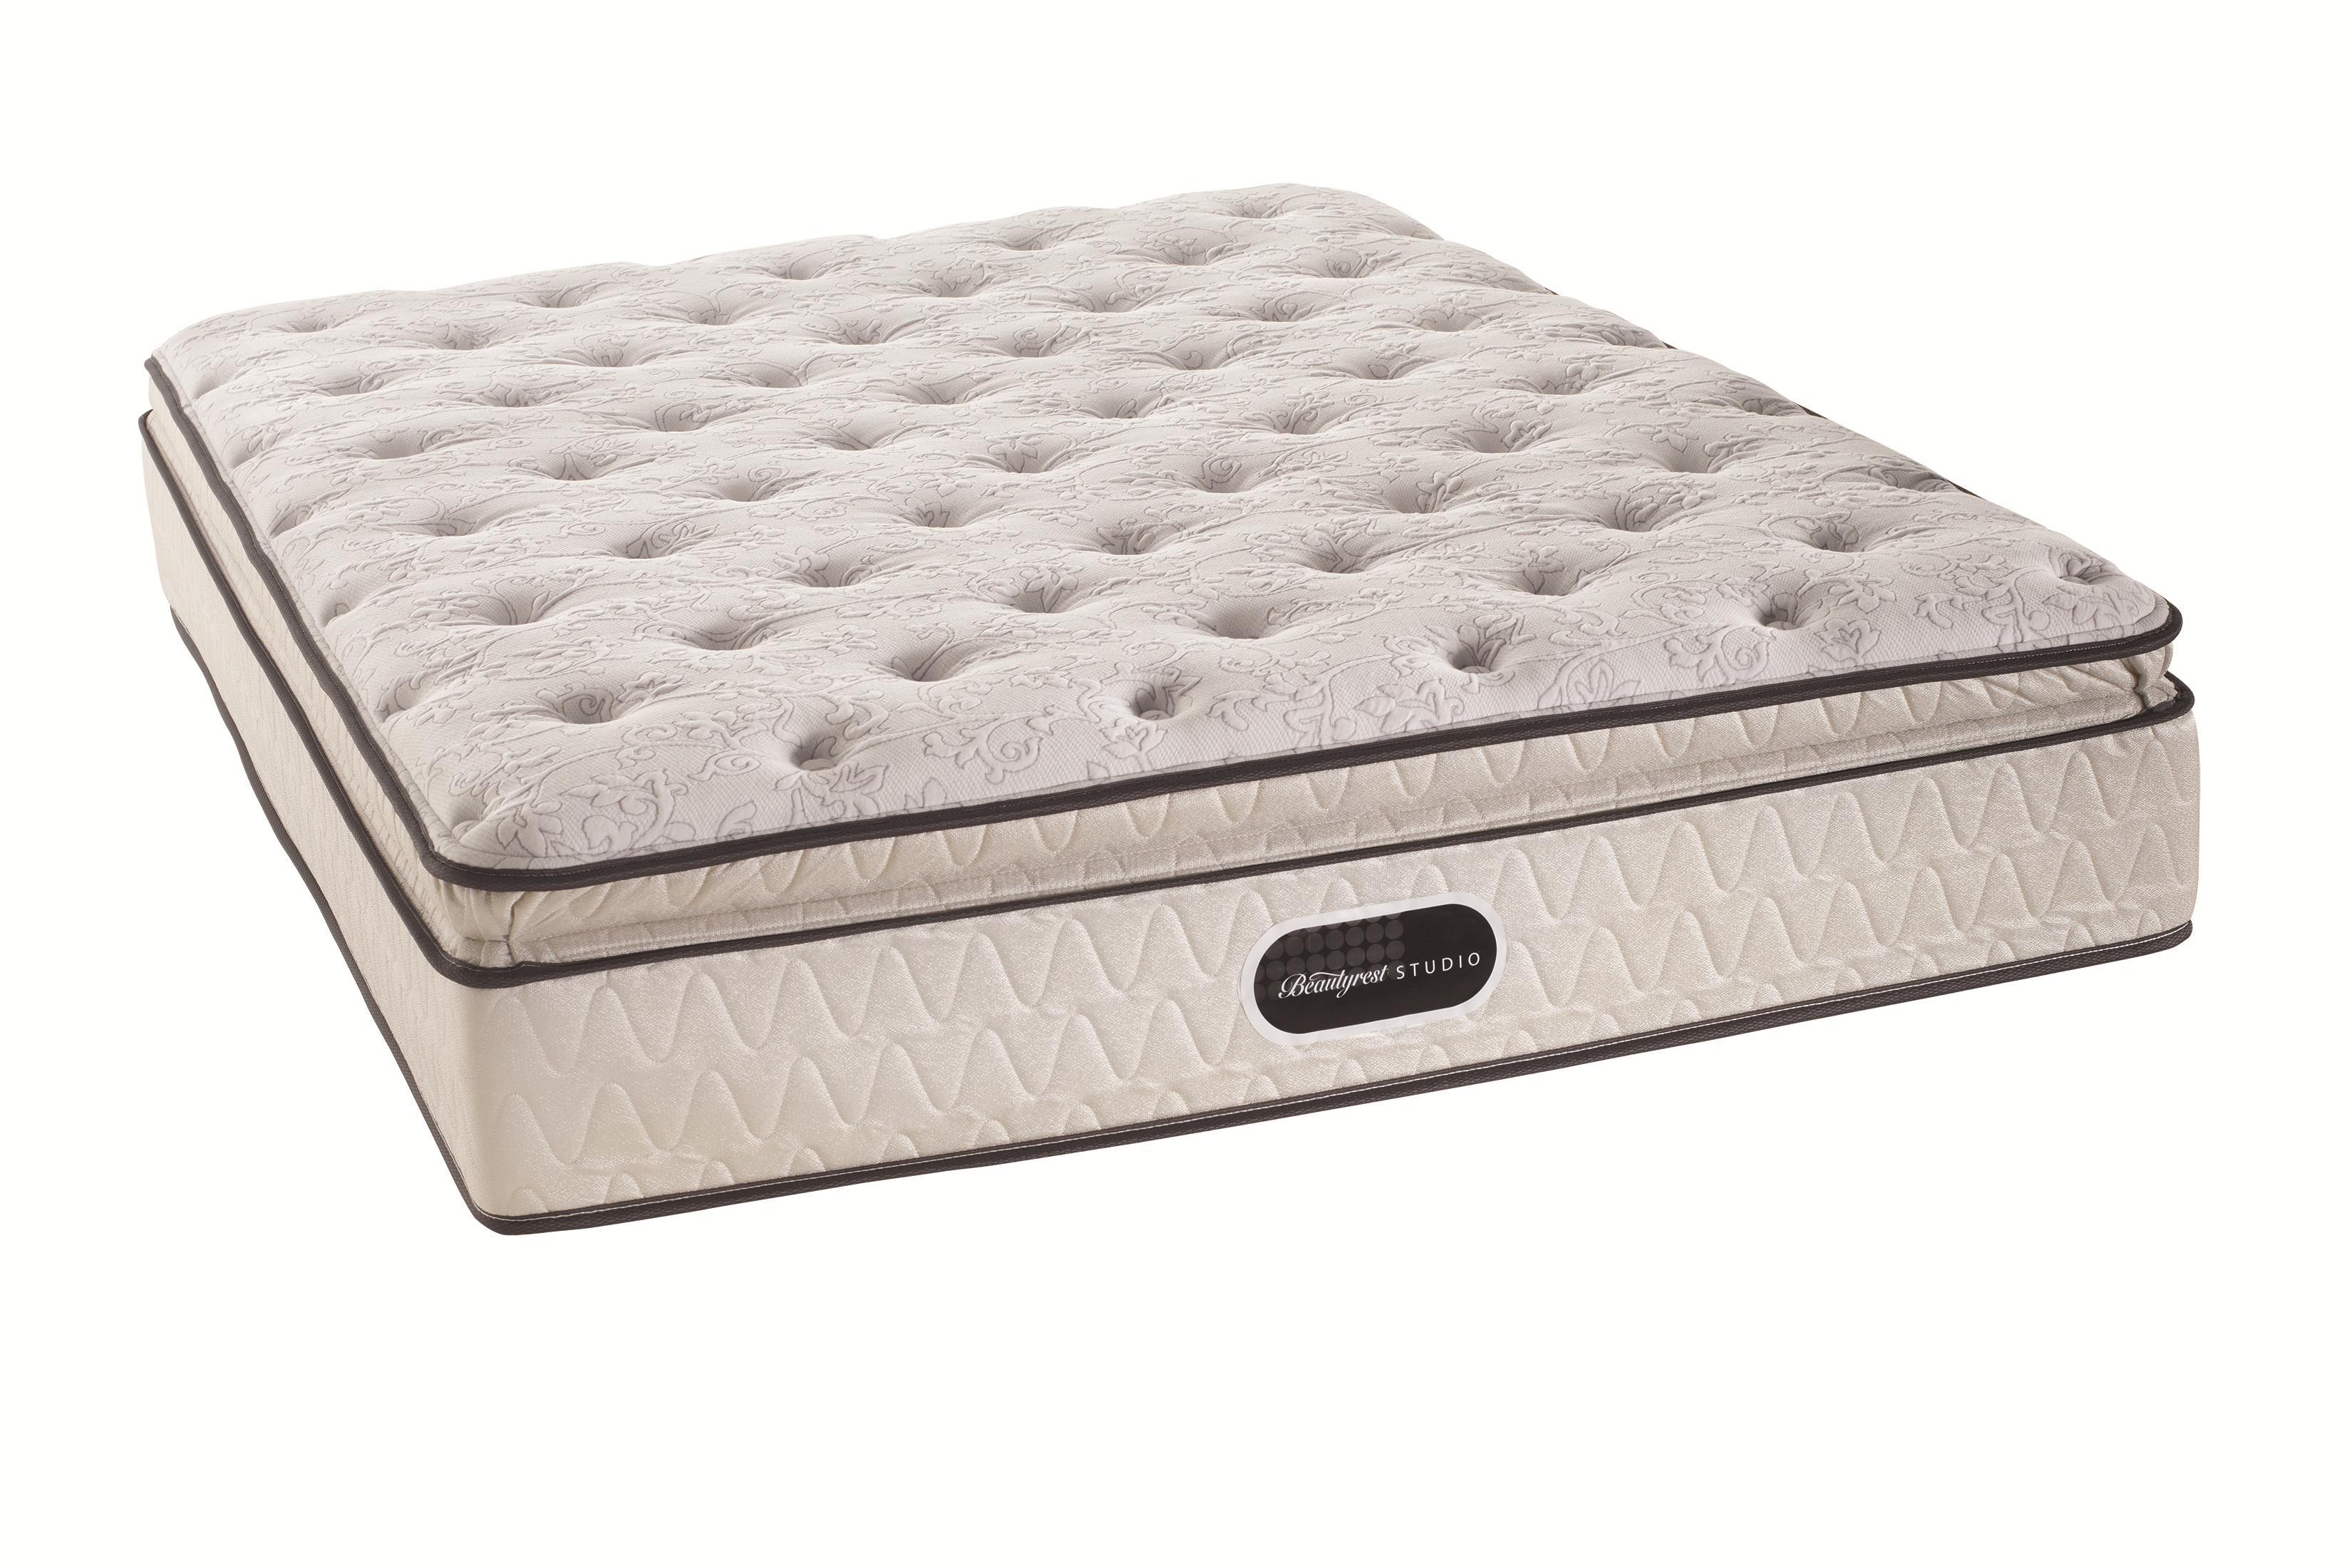 simmons beautyrest studio cavendish queen firm mattress